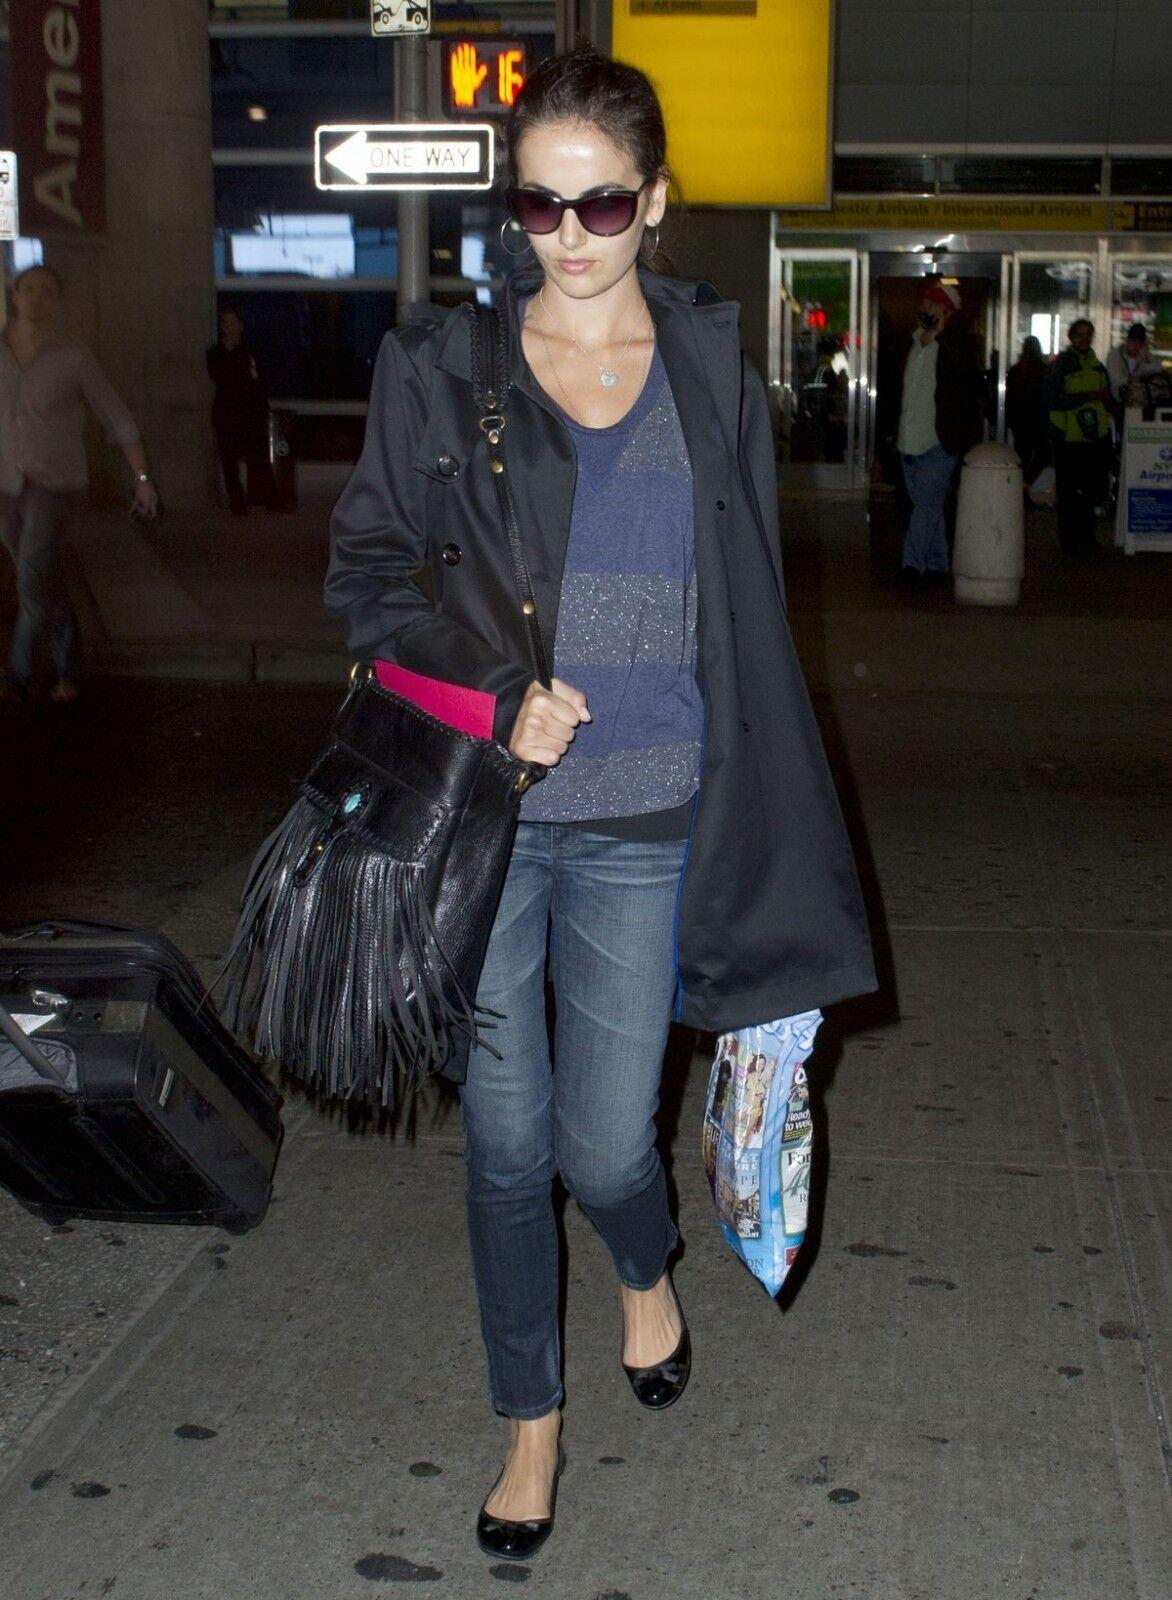 AG Adriano goldschmied Super Skinny Zip LEGGING Jeans 4 Years Dark RARE  28